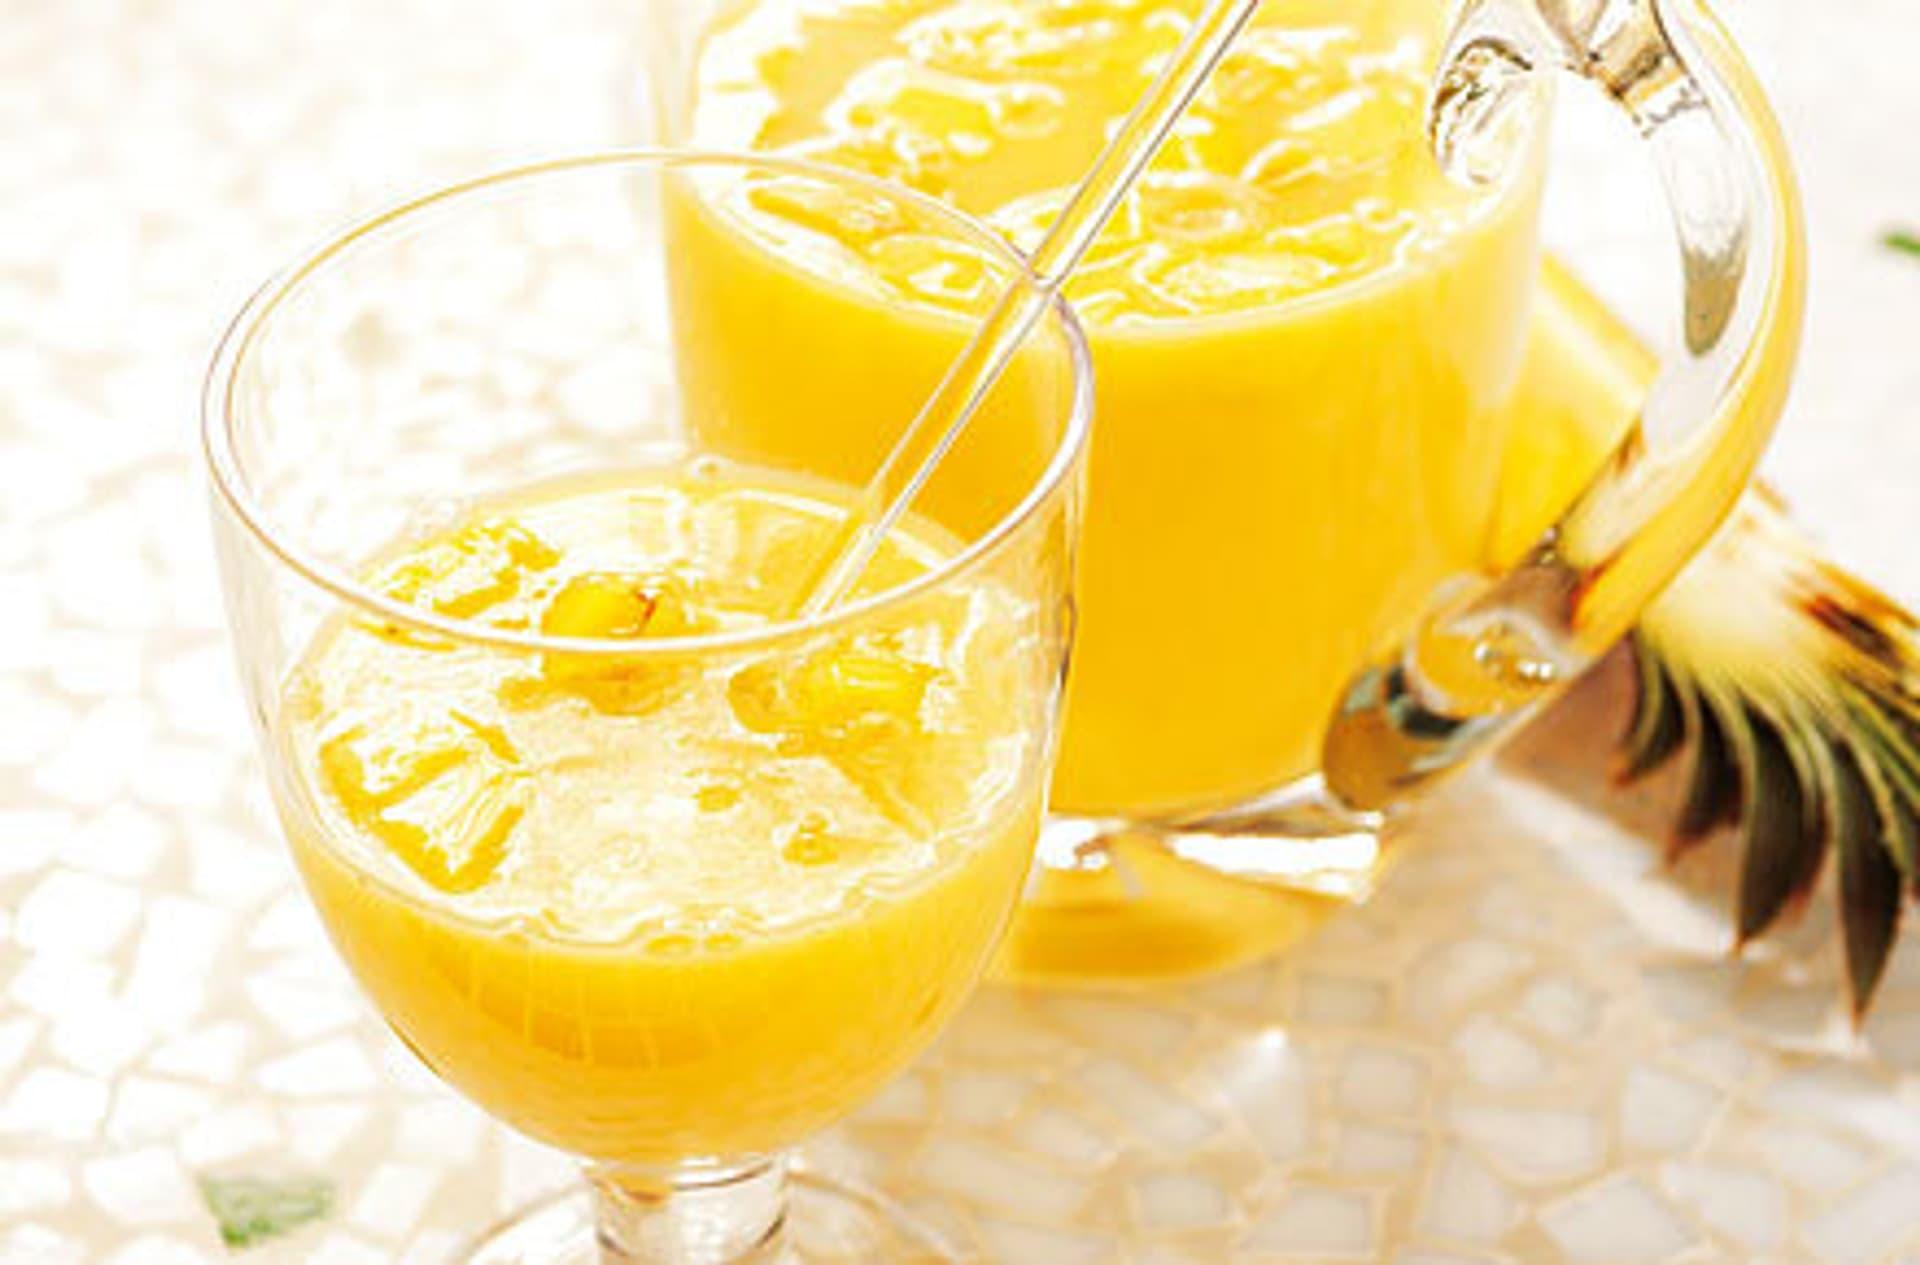 Eierlikoer bowle mit mango